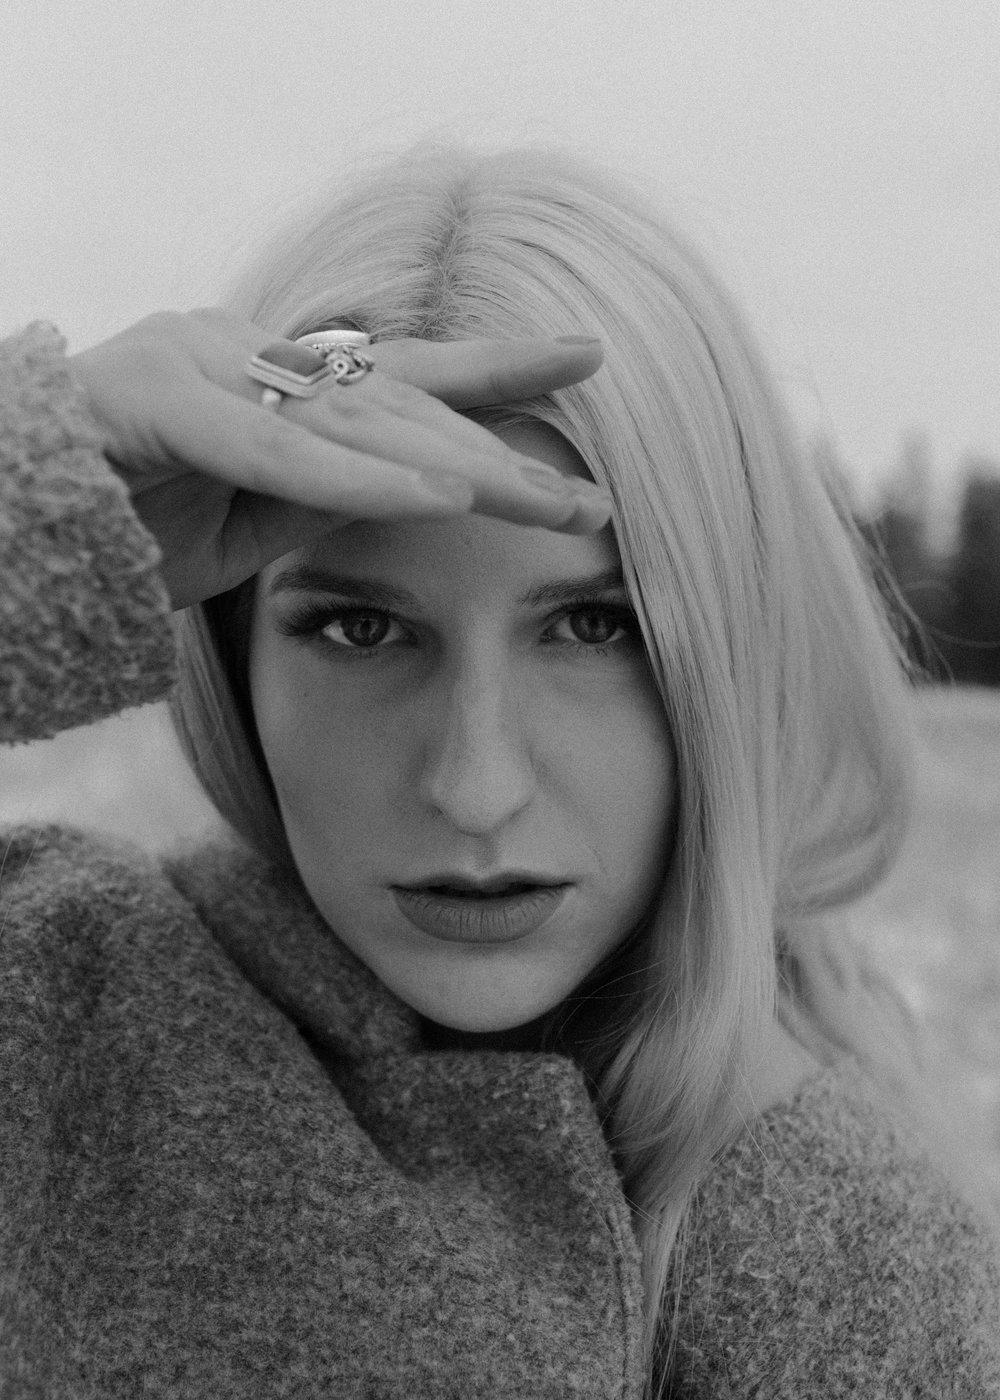 Alycia-Lovell-Photography-Film-Portraits-9788.jpg